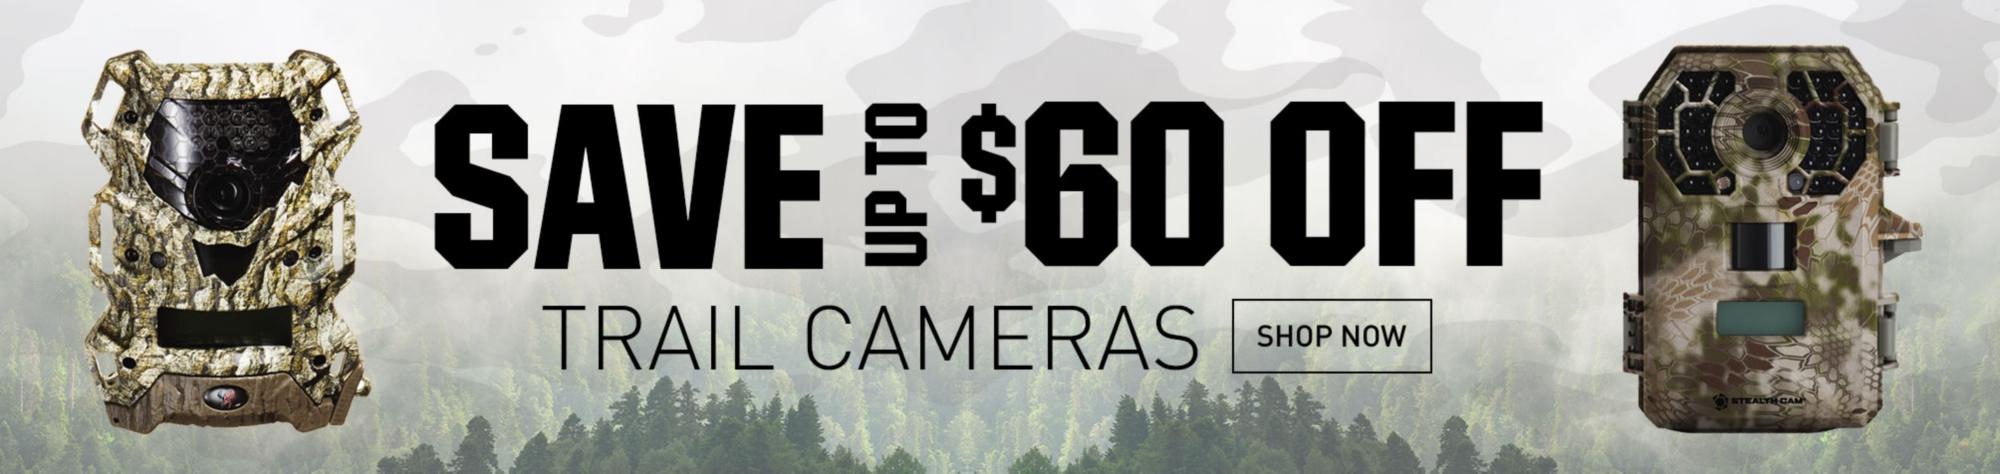 Shop Trail Cameras